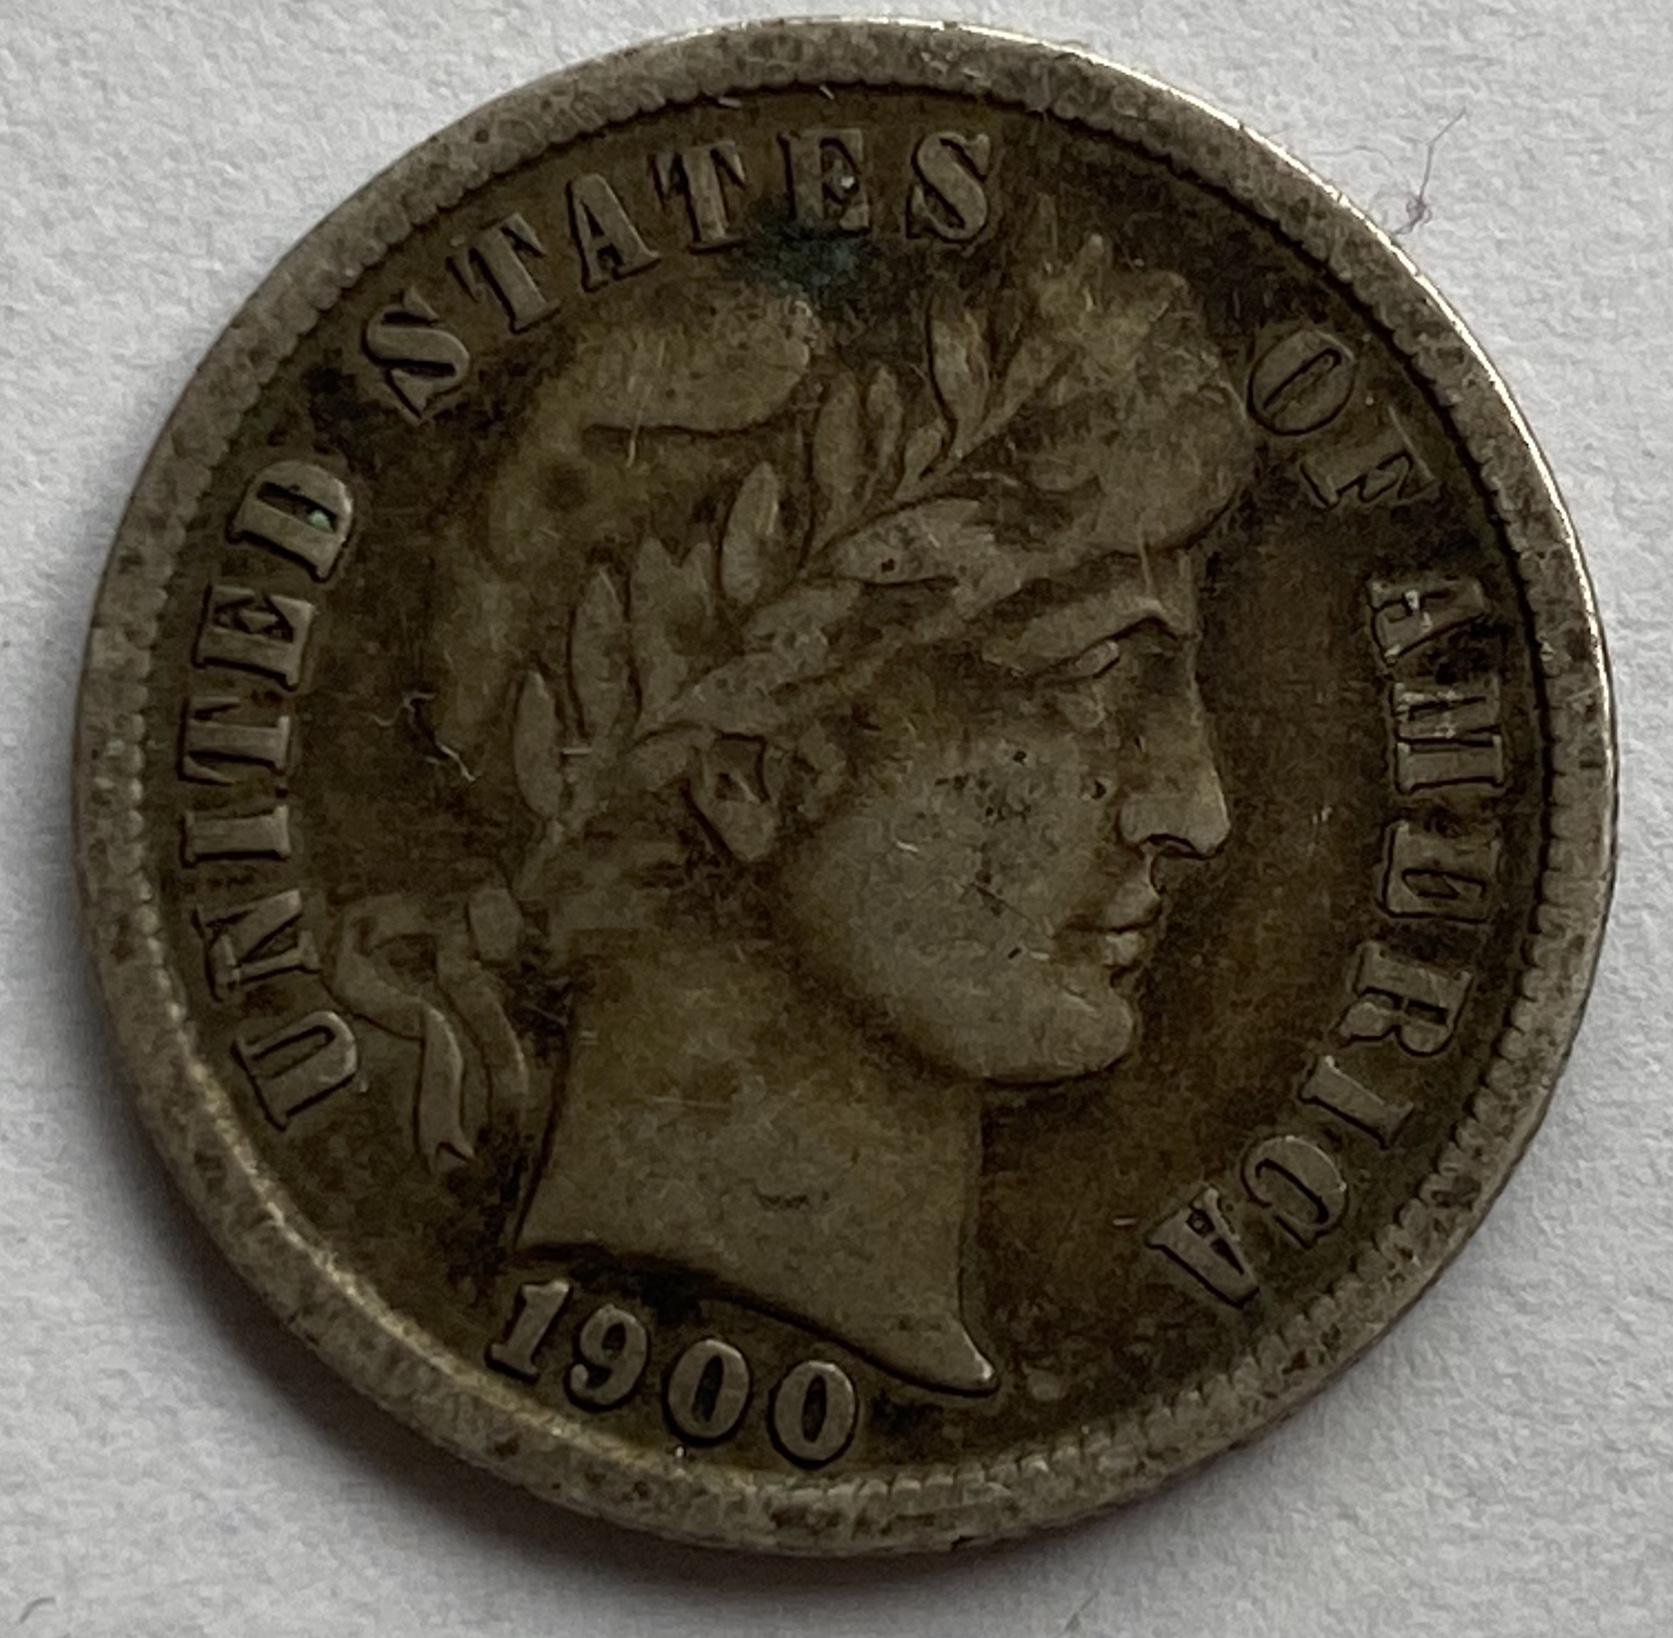 america one dime coin